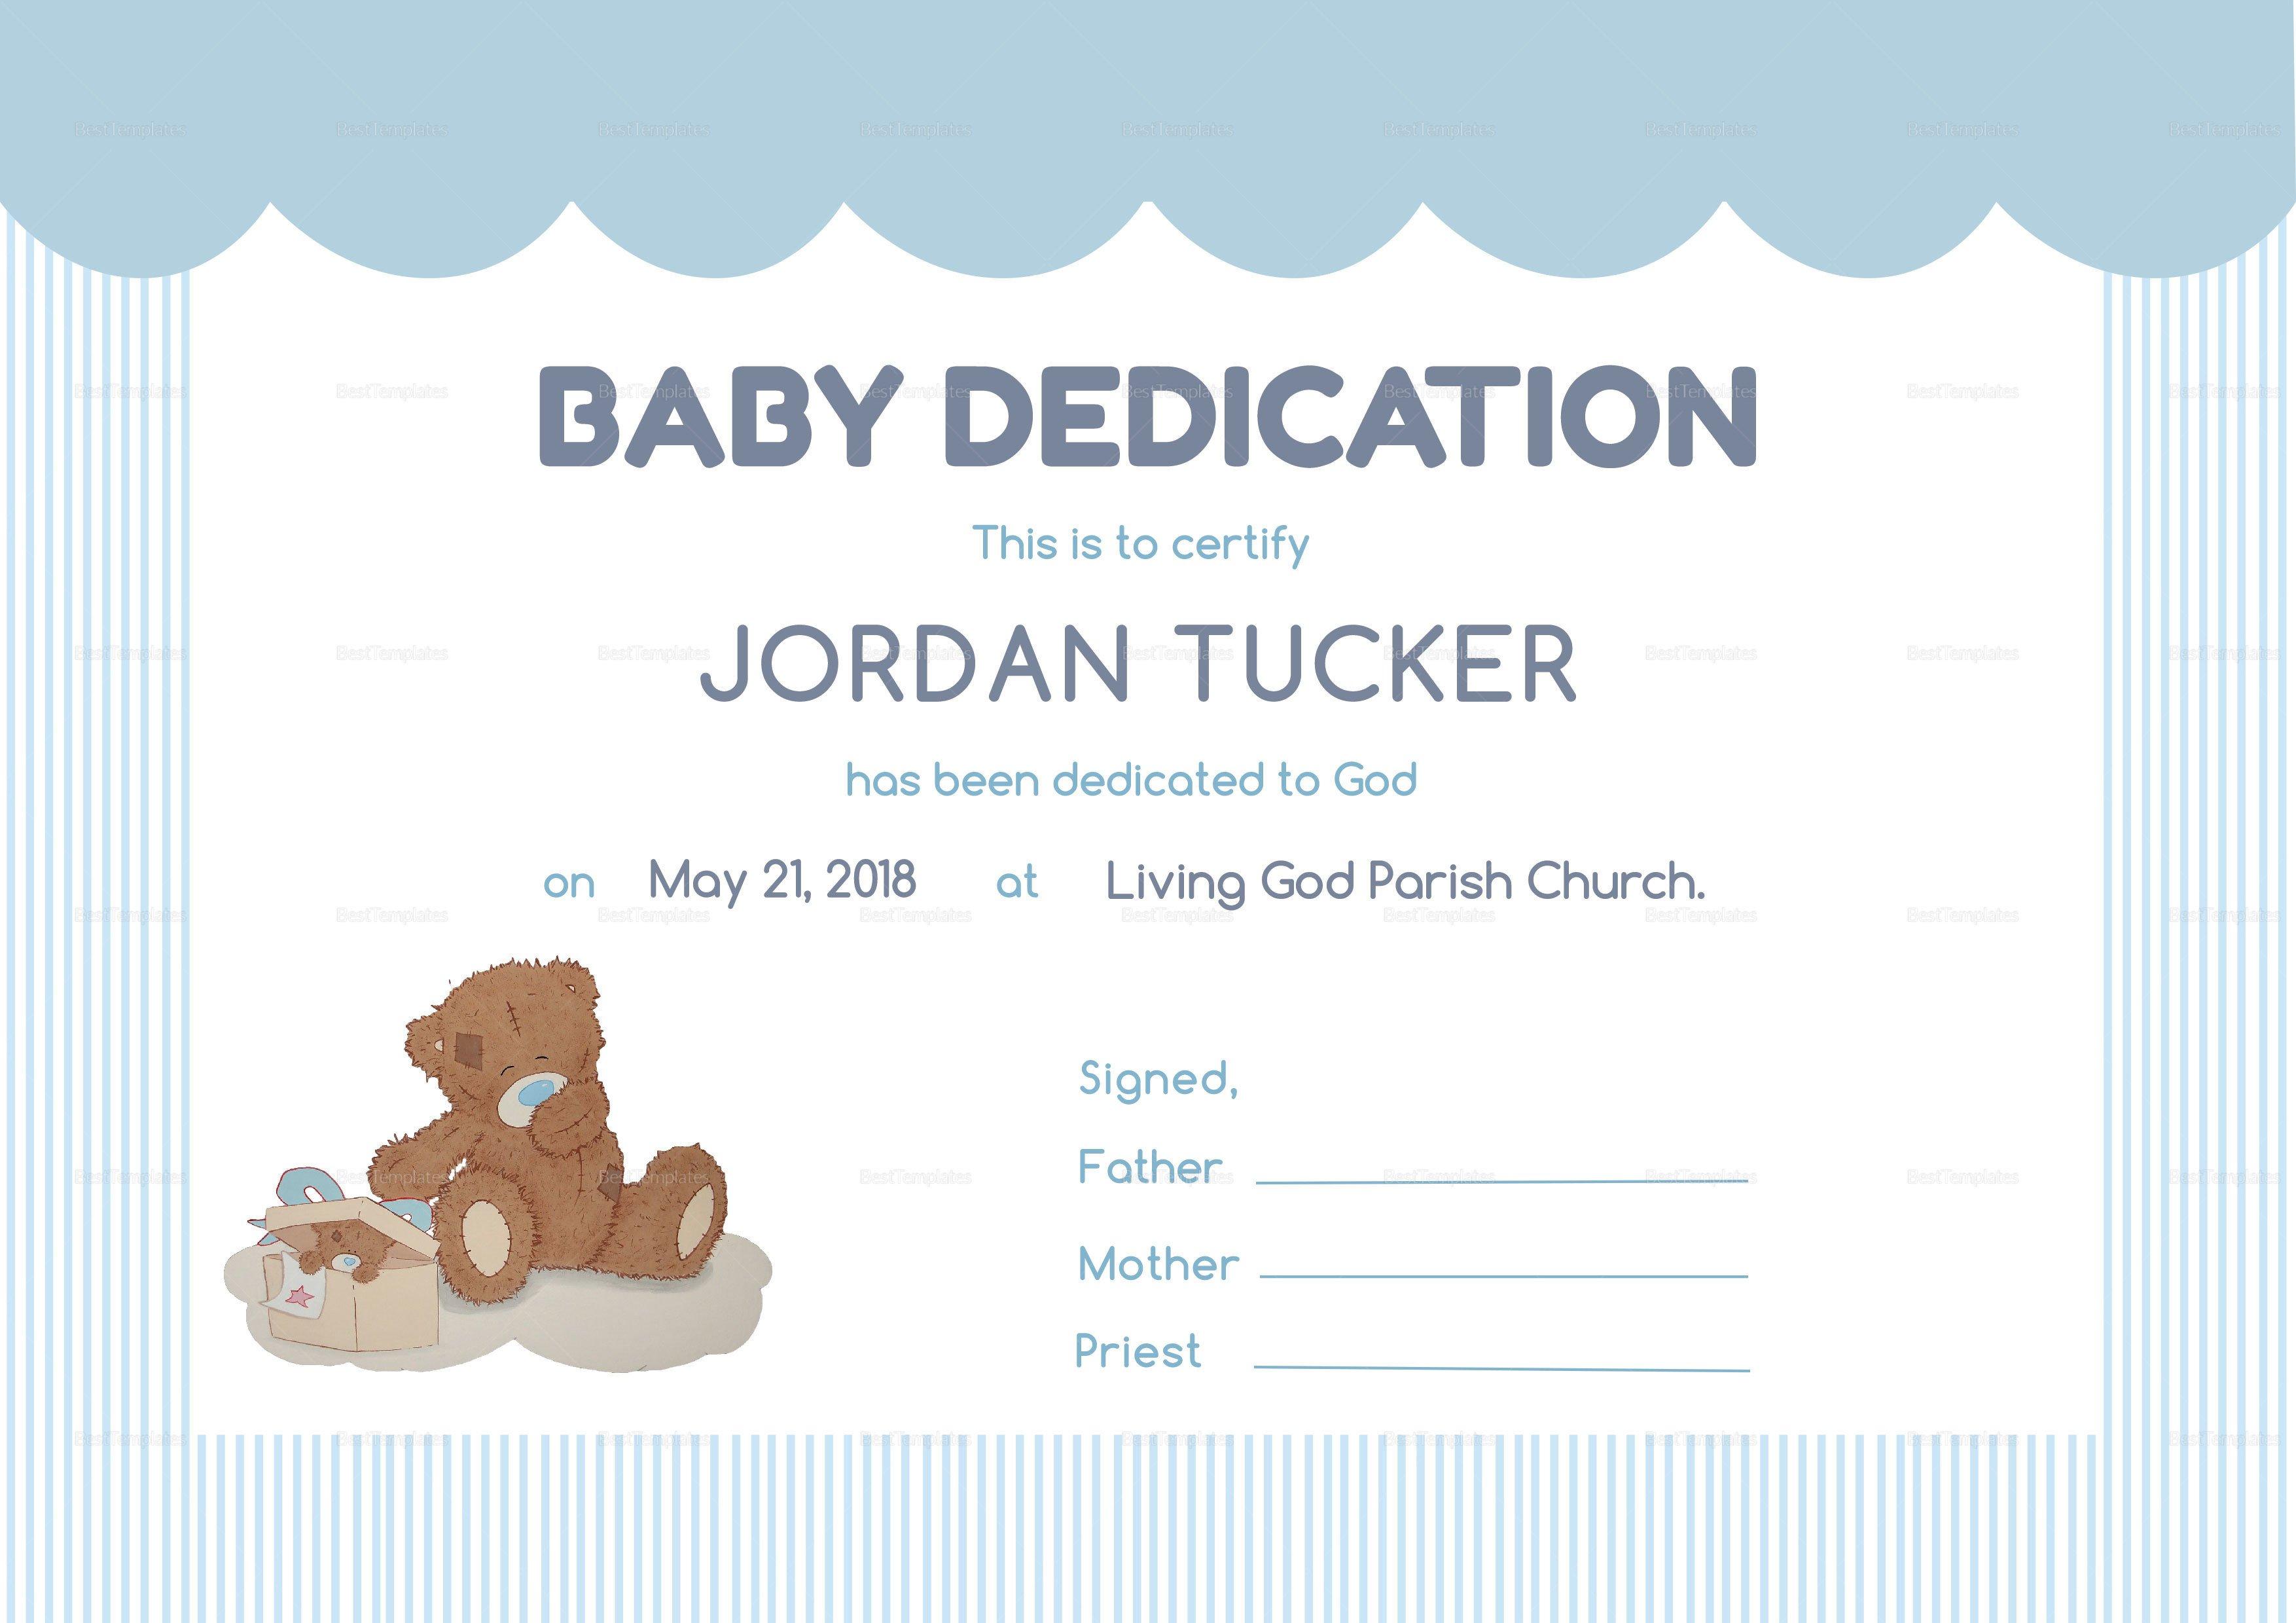 Baby Dedication Certificate Templates Baby Dedication Certificate Design Template In Psd Word